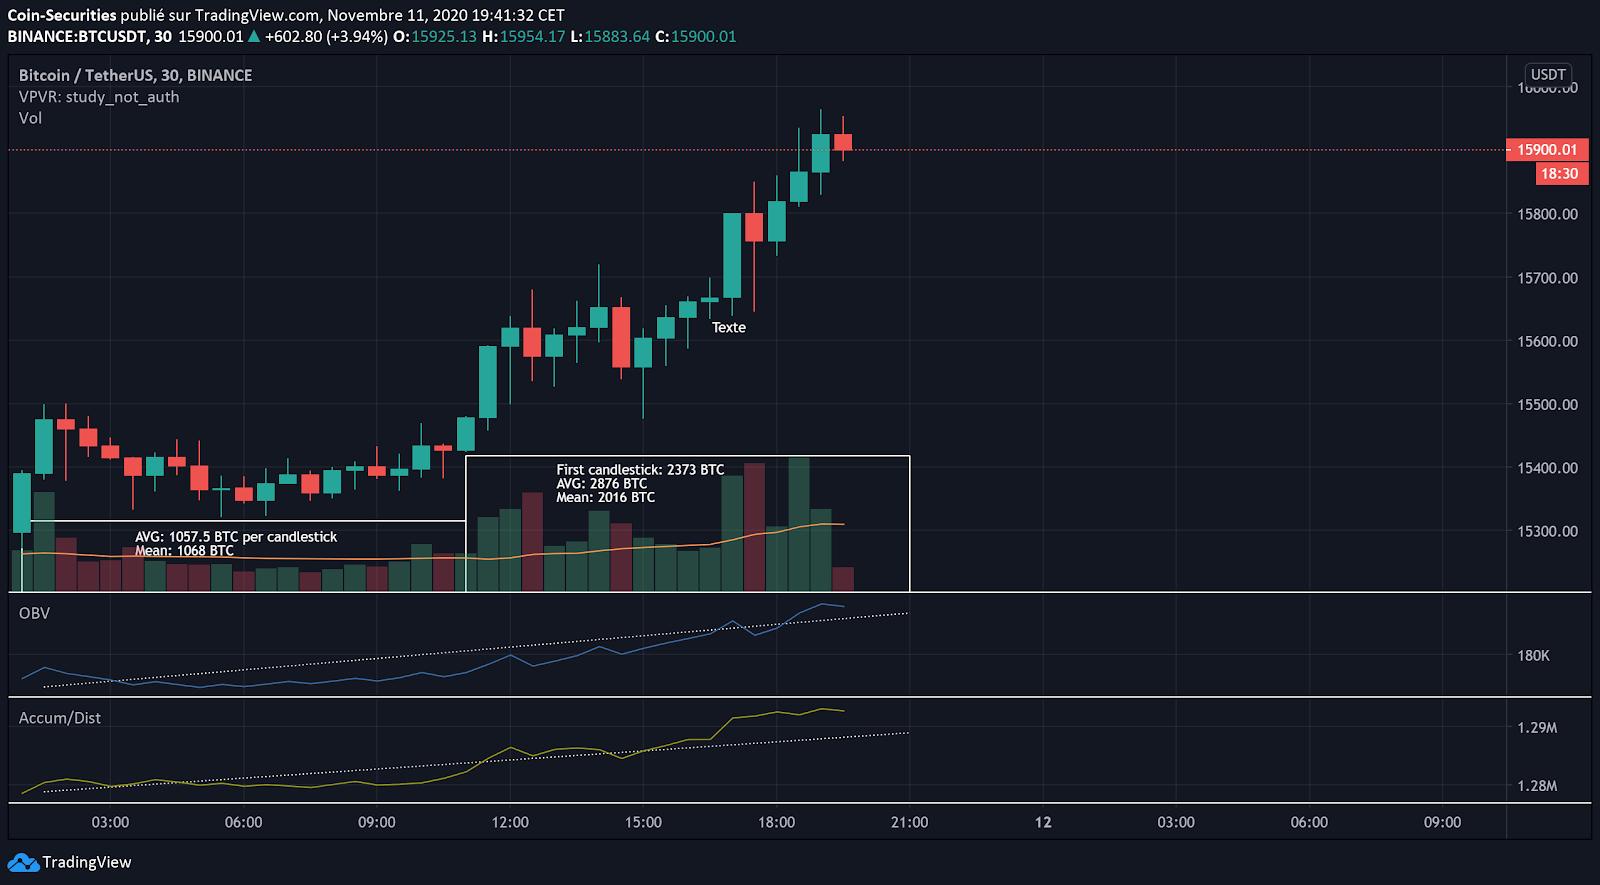 Bitcoin price prediction: BTC/USDT has $16,000 in sight but bears grow stronger 2